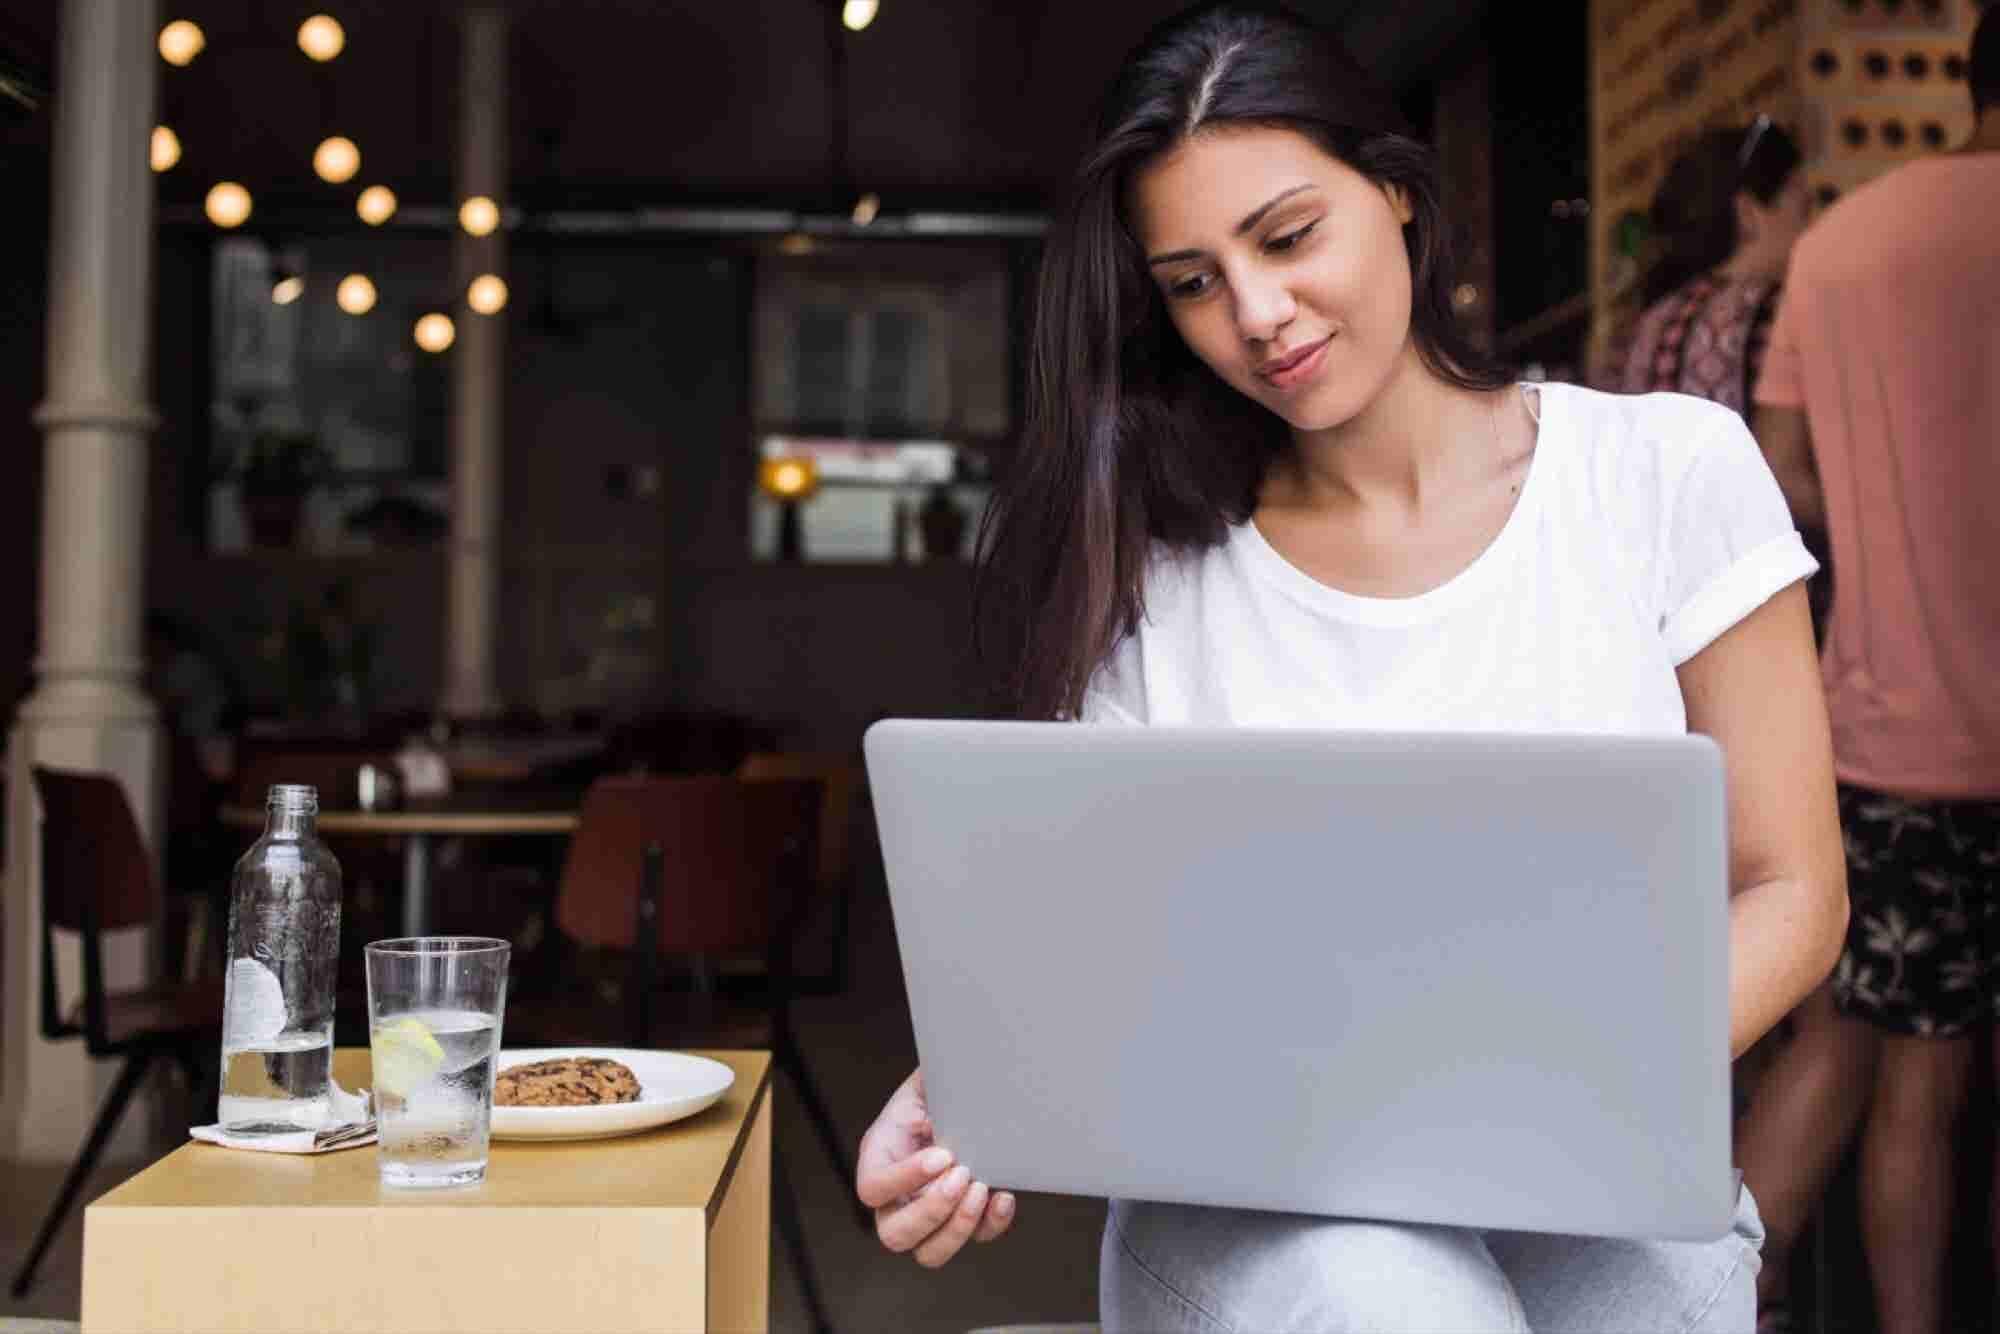 How an Internship Abroad Can Kickstart Your Entrepreneurial Journey